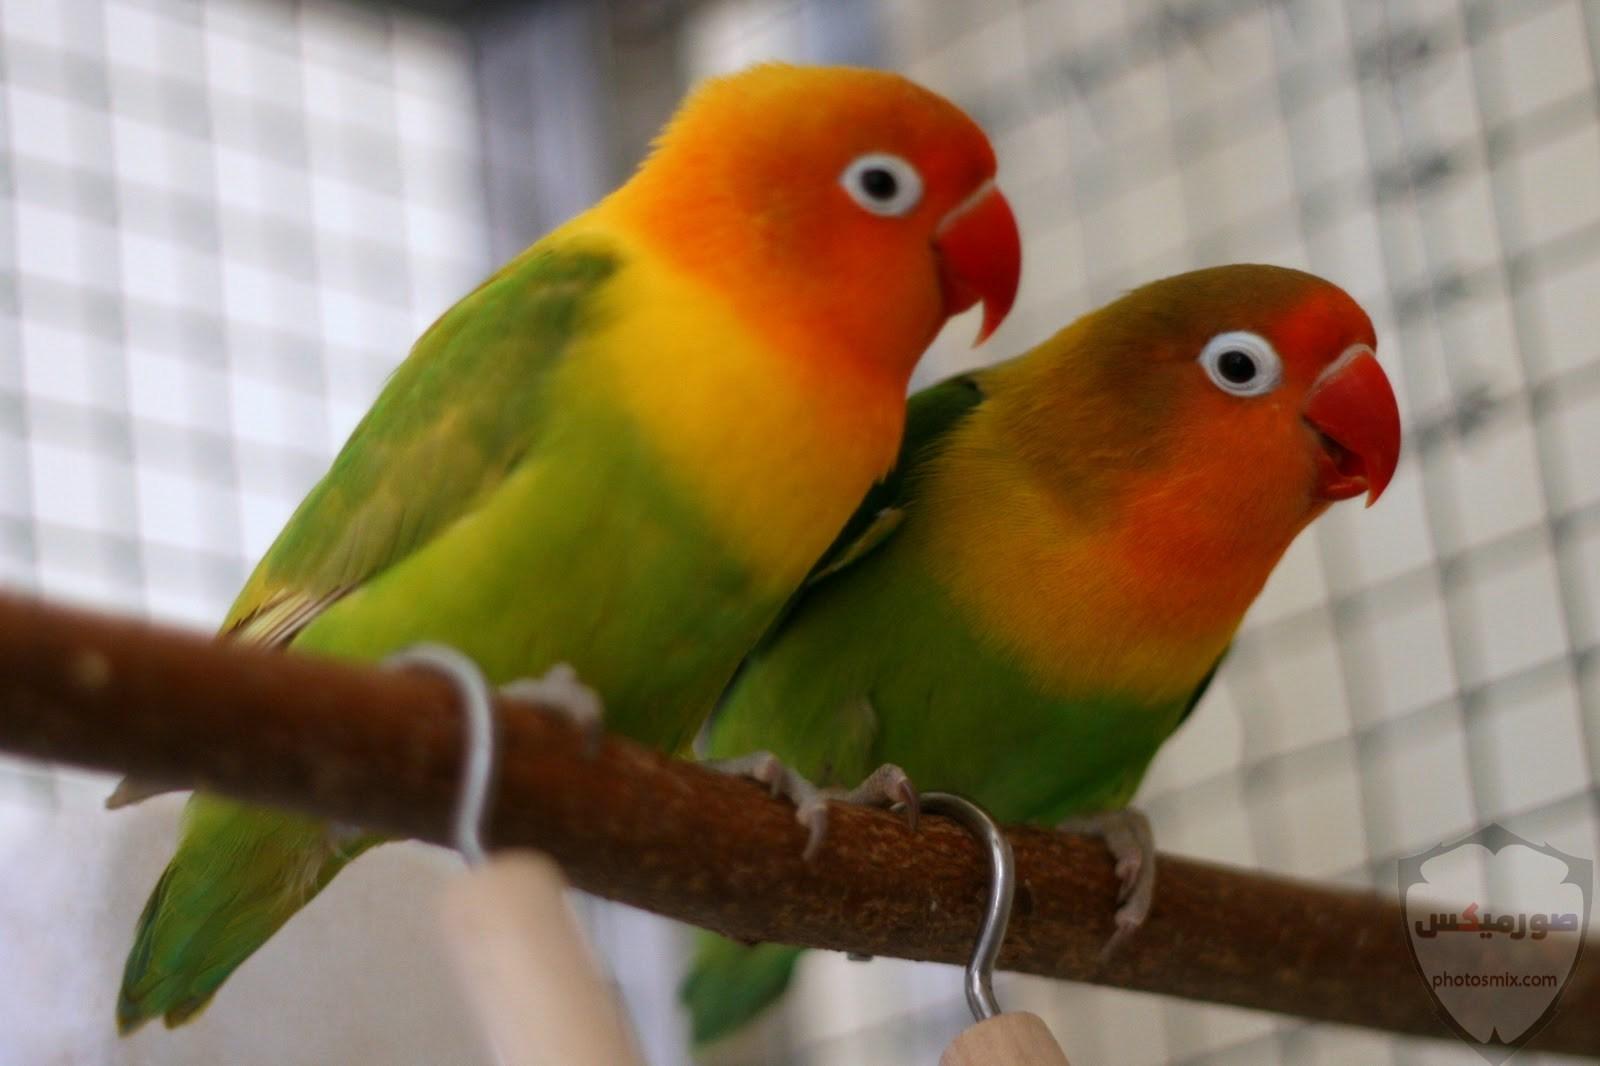 صور عصافير أجمل صور عصافير صور عصفور 2020 9